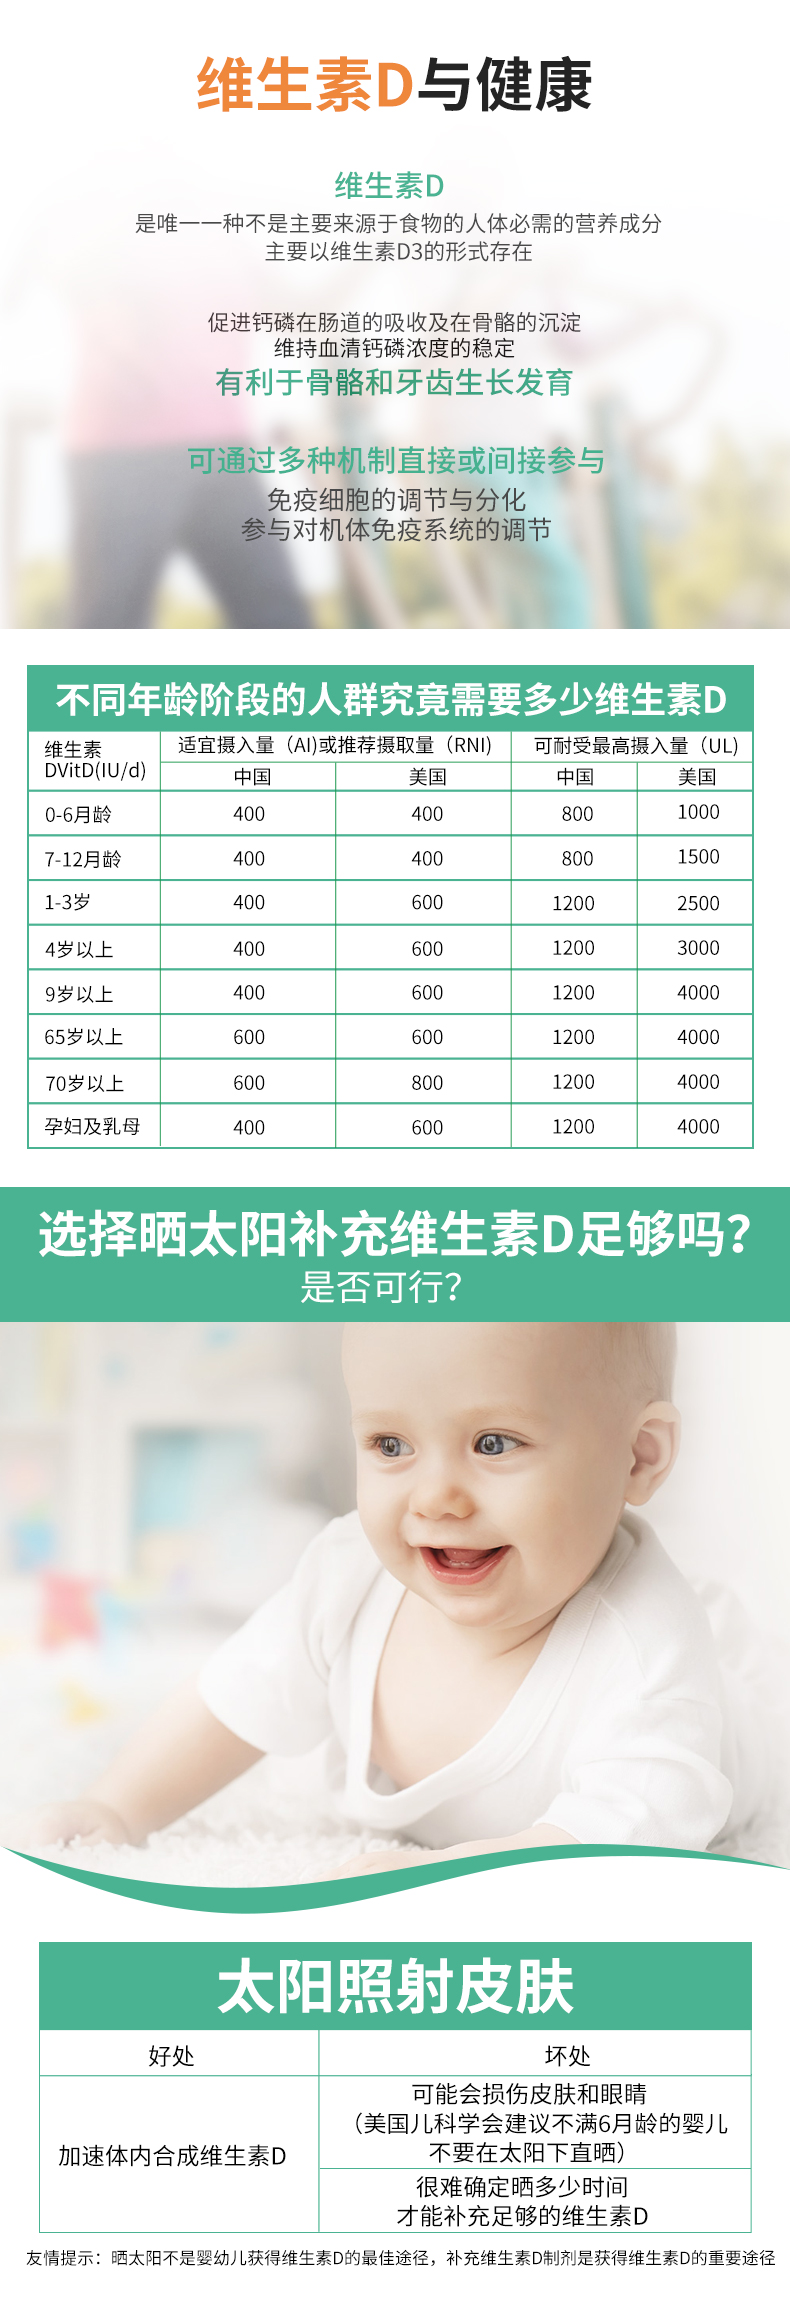 CATALO家得路美国进口婴幼儿维生素d儿童宝宝d3滴剂*2 产品系列 第5张